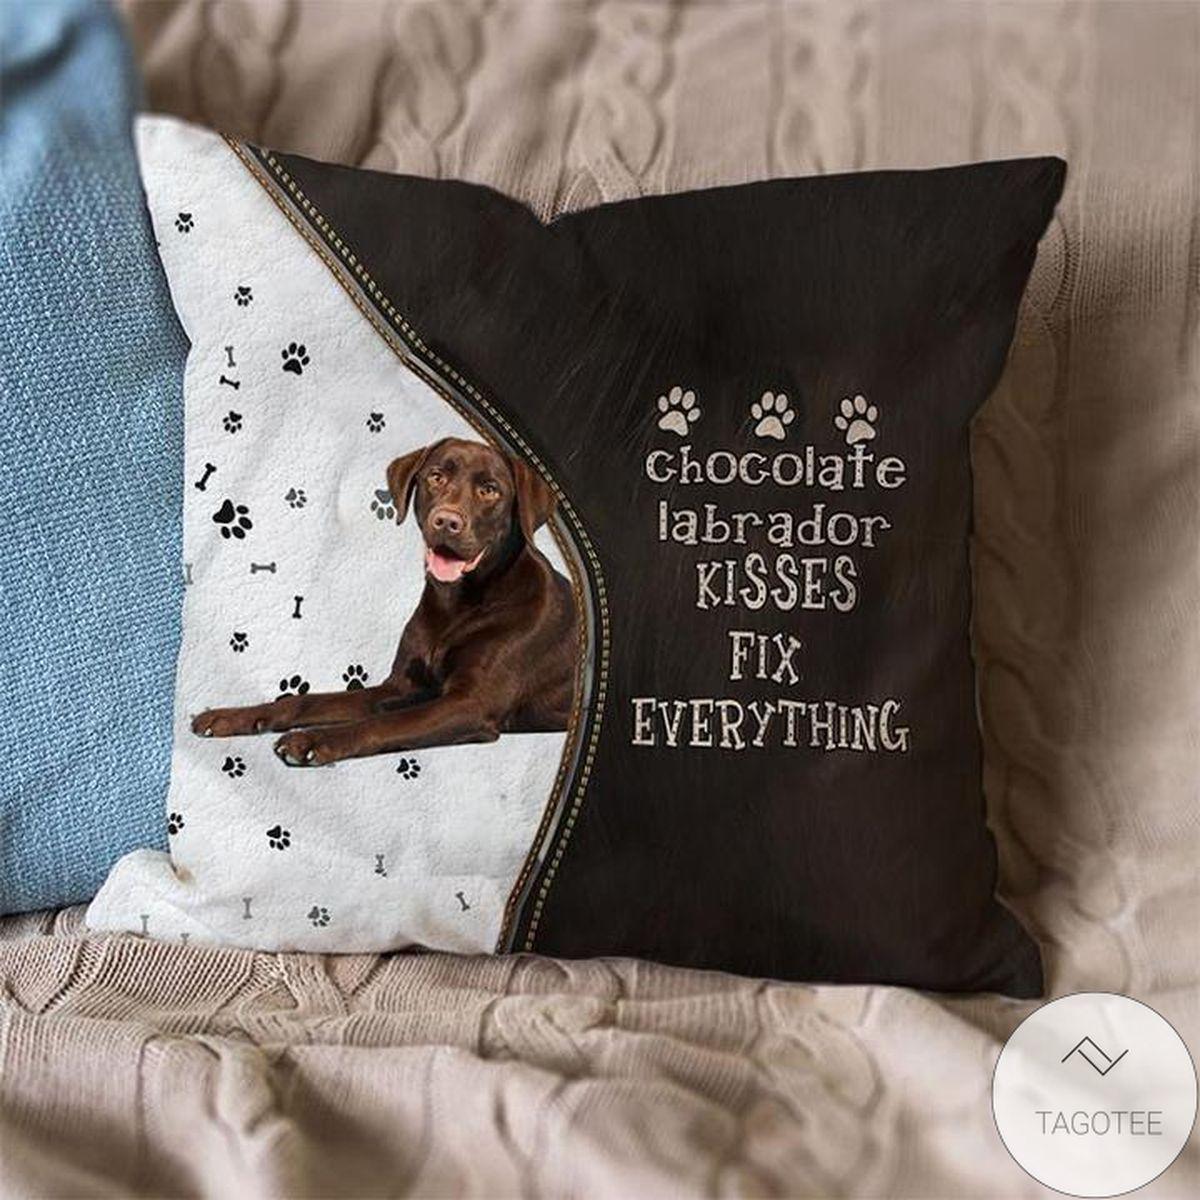 Nice Chocolate Labrador Kisses Fix Everything Pillowcase